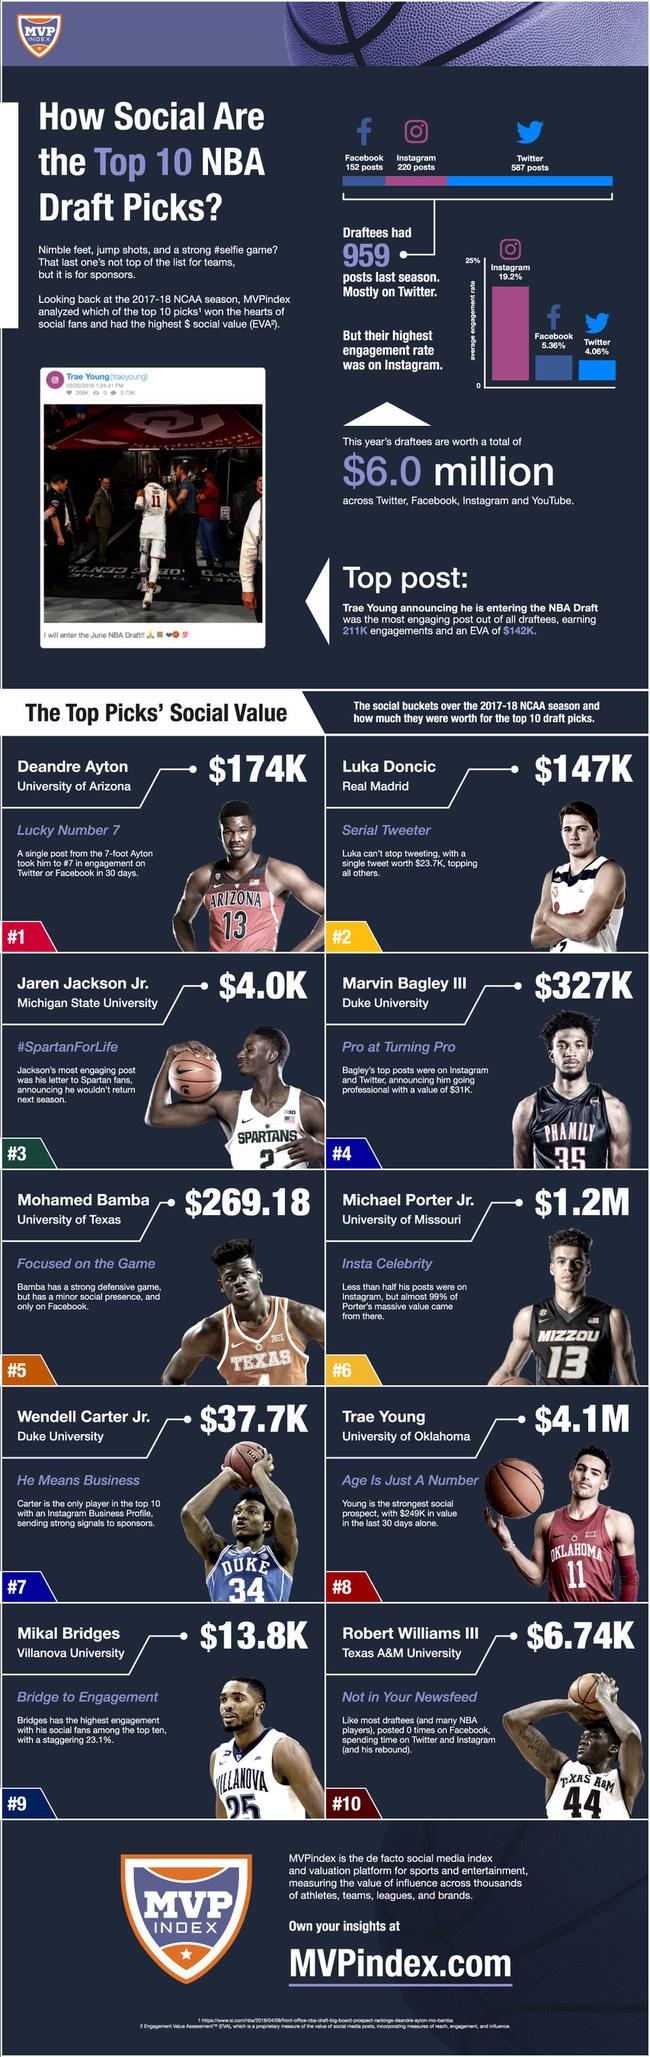 MVPindex takes a look at how the 2018 NBA Draft Class stacks up on social media.